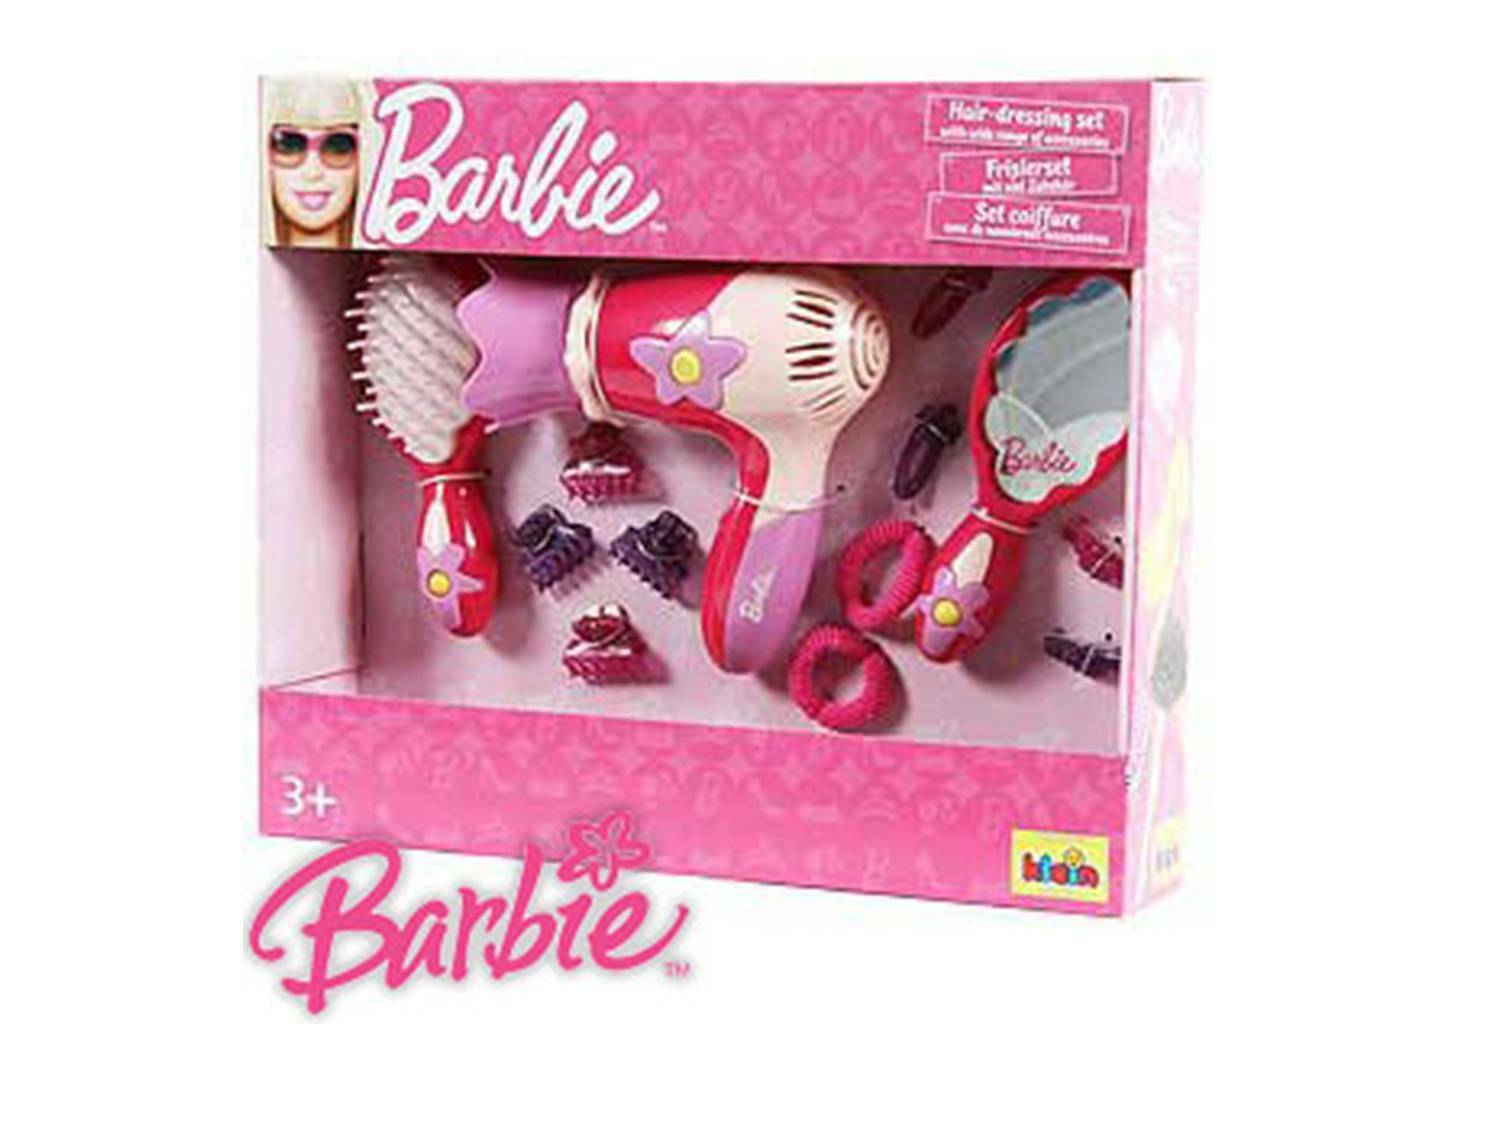 Toy Barbie Hairdressing Set Hair Dryer Brush Mirror Accessories Pink Fun S